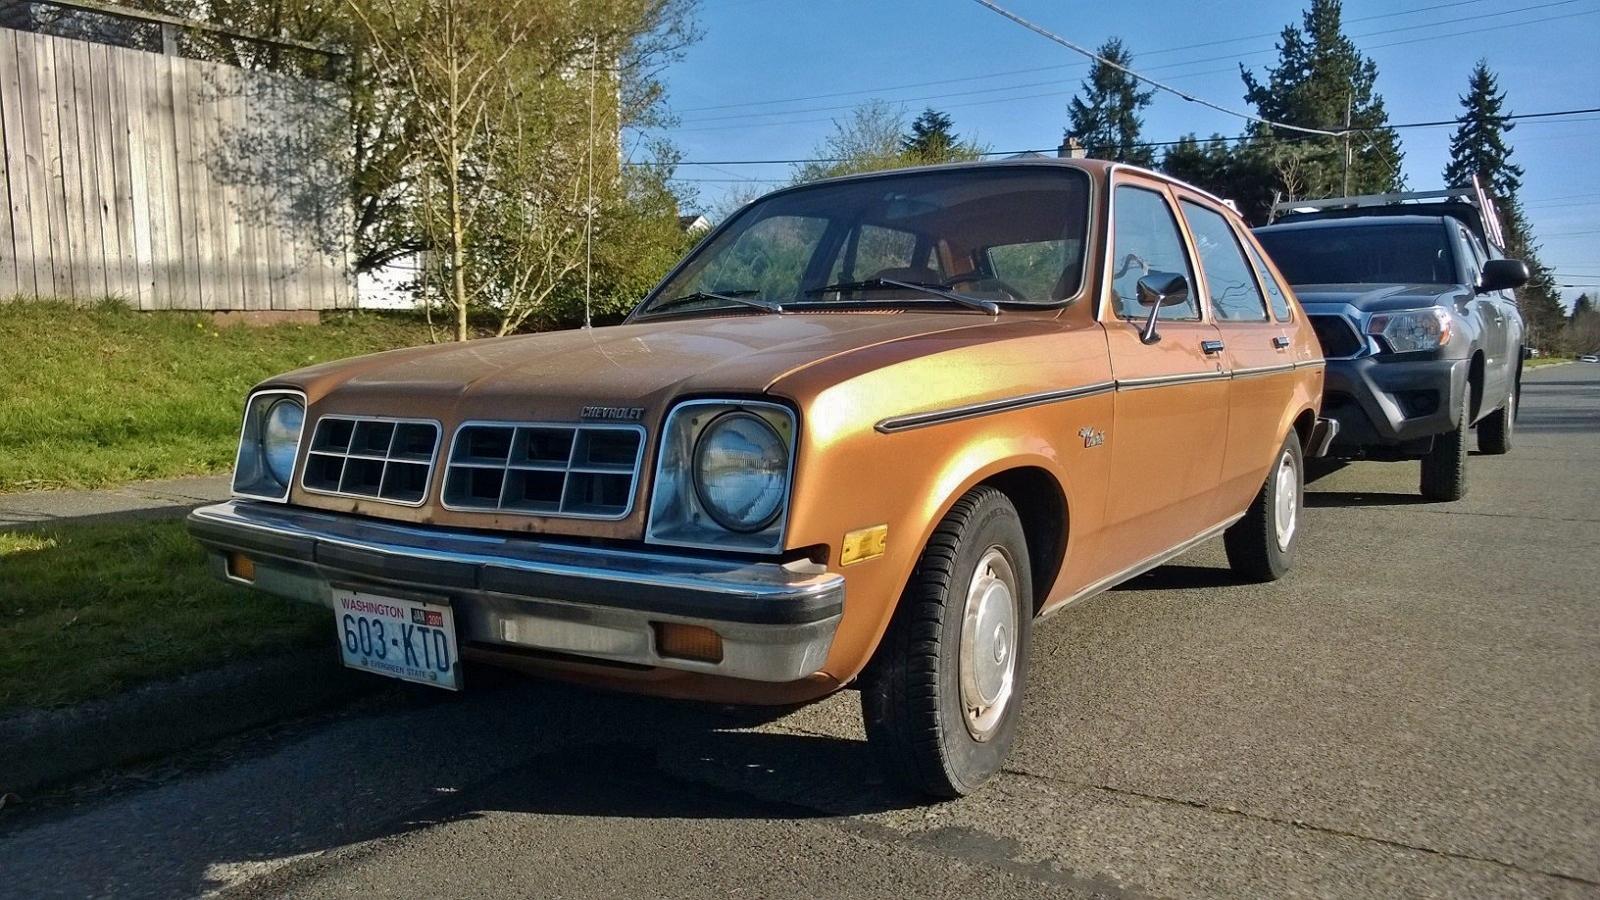 Seattle S Parked Cars 1978 Chevrolet Chevette 5 Door